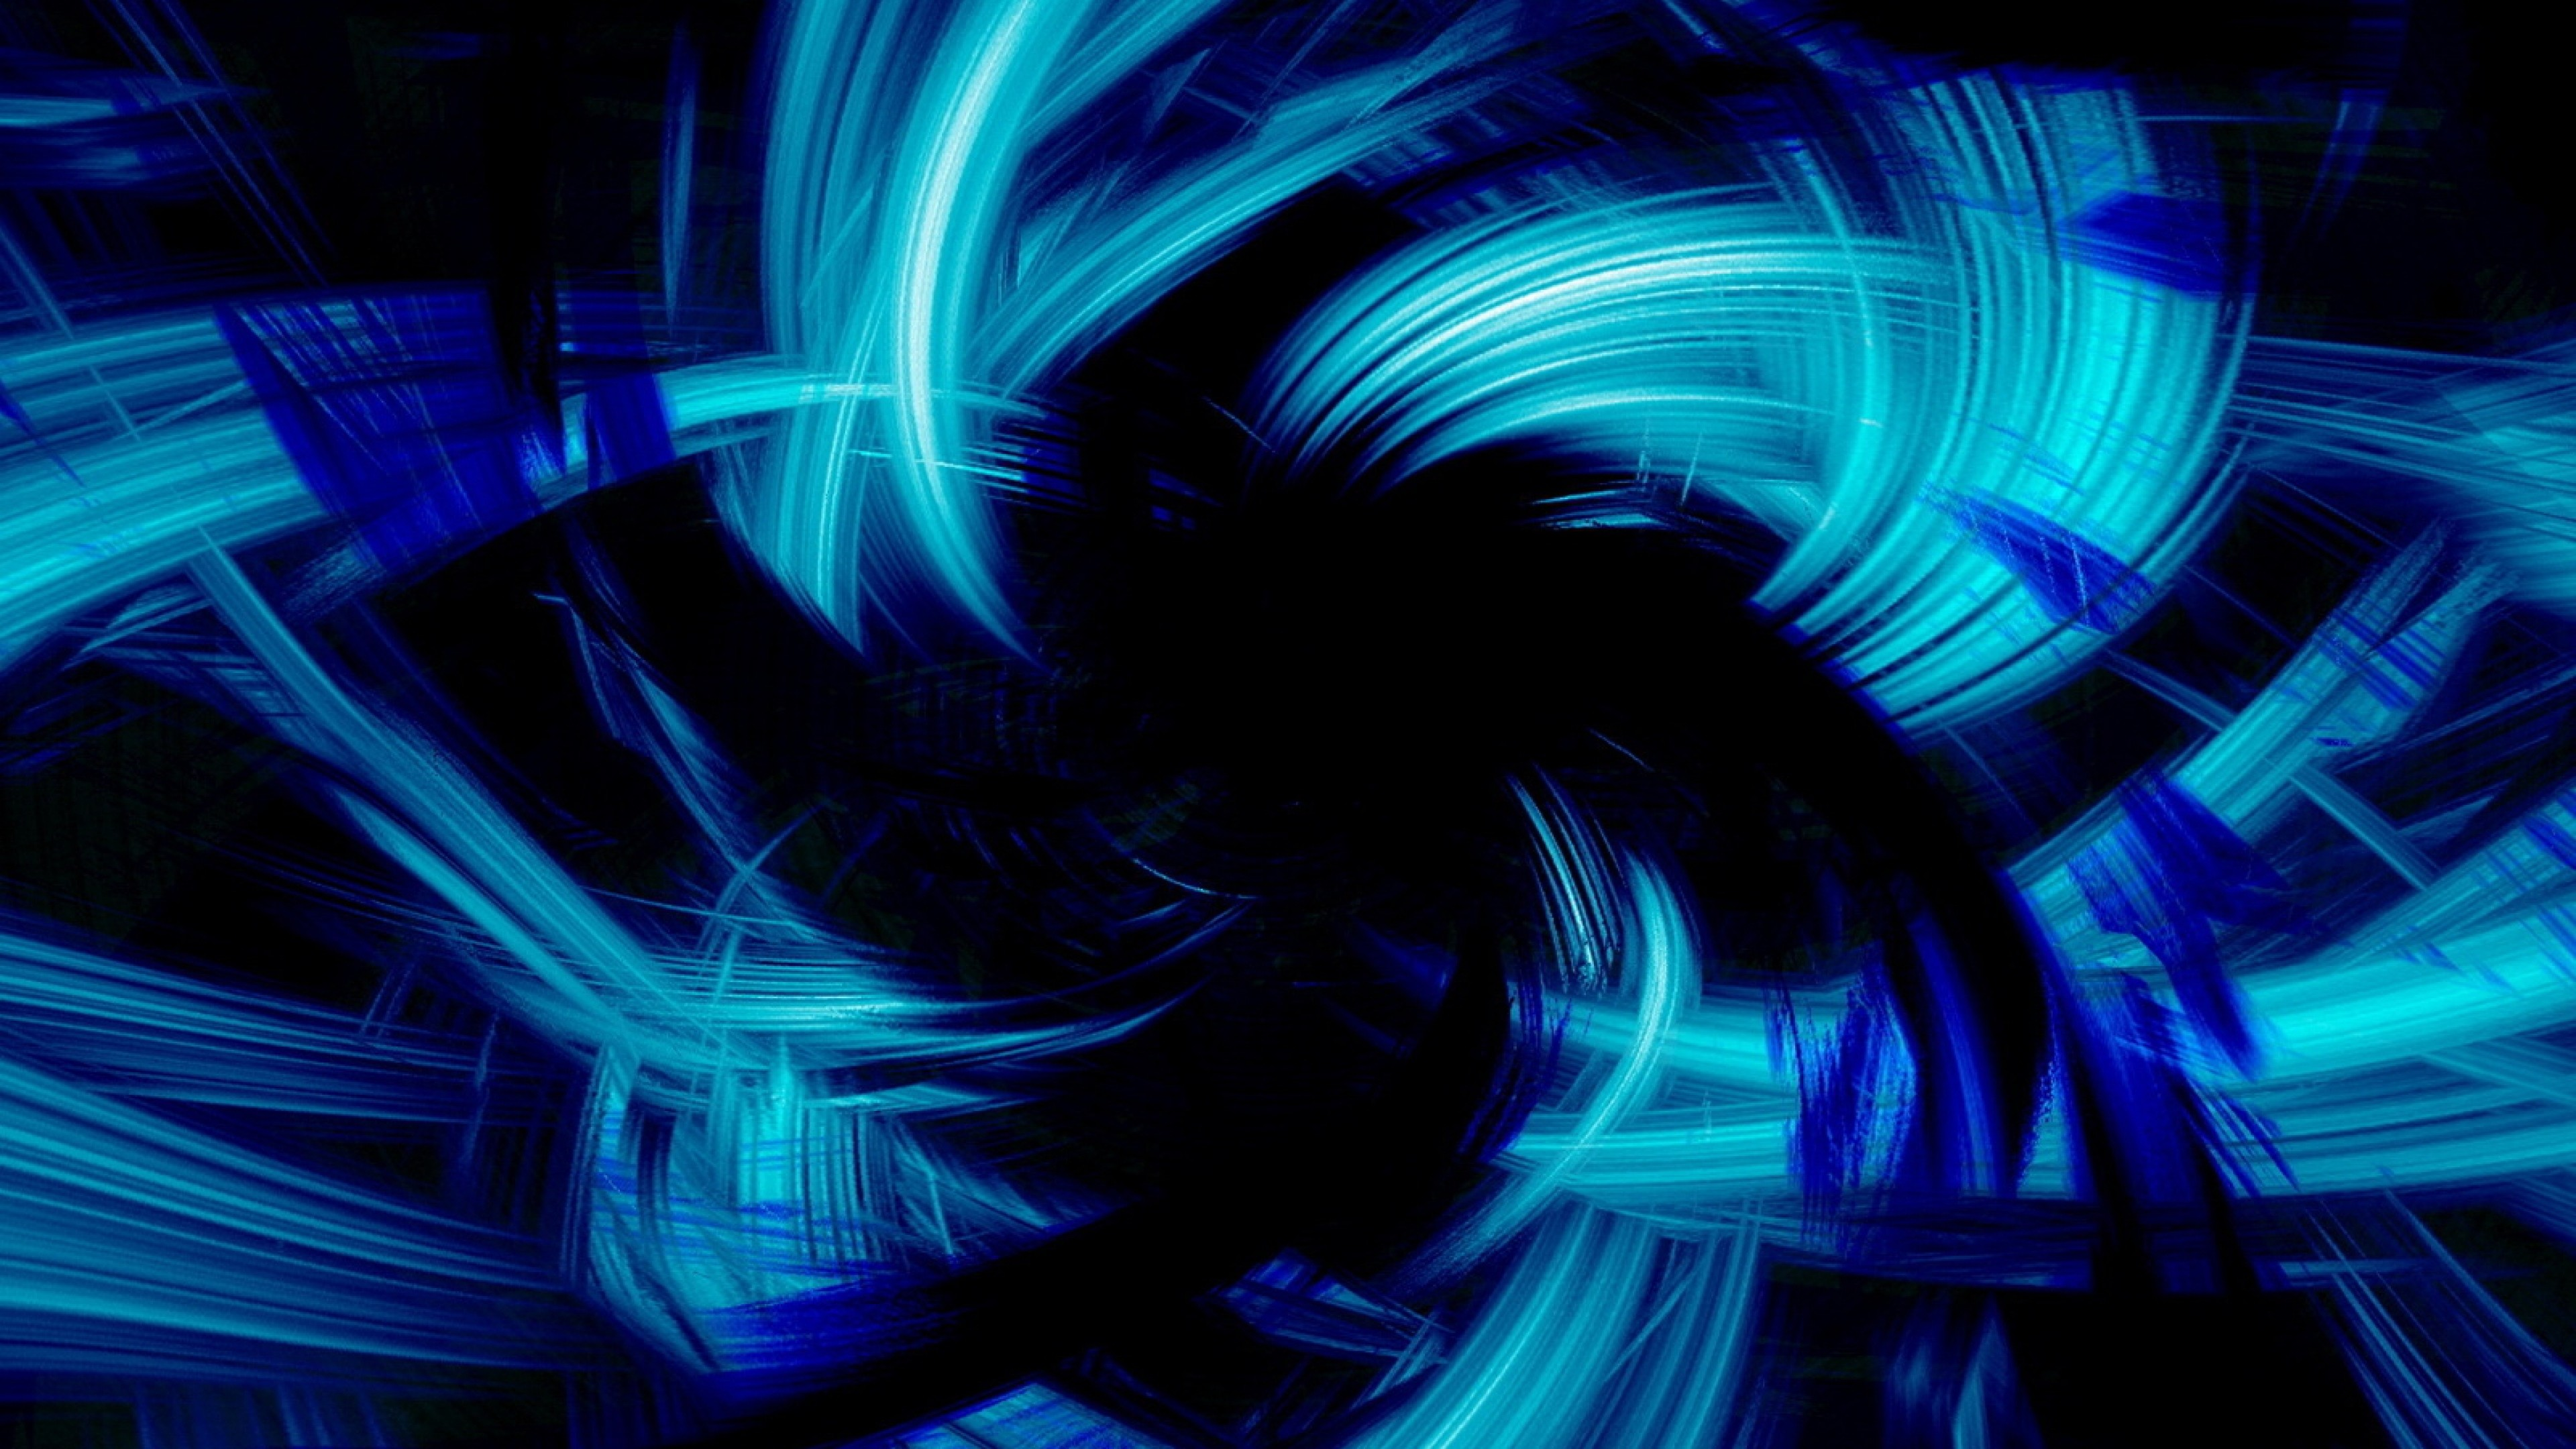 … Background 4K Ultra HD. Wallpaper neon, lines, stripes, dark